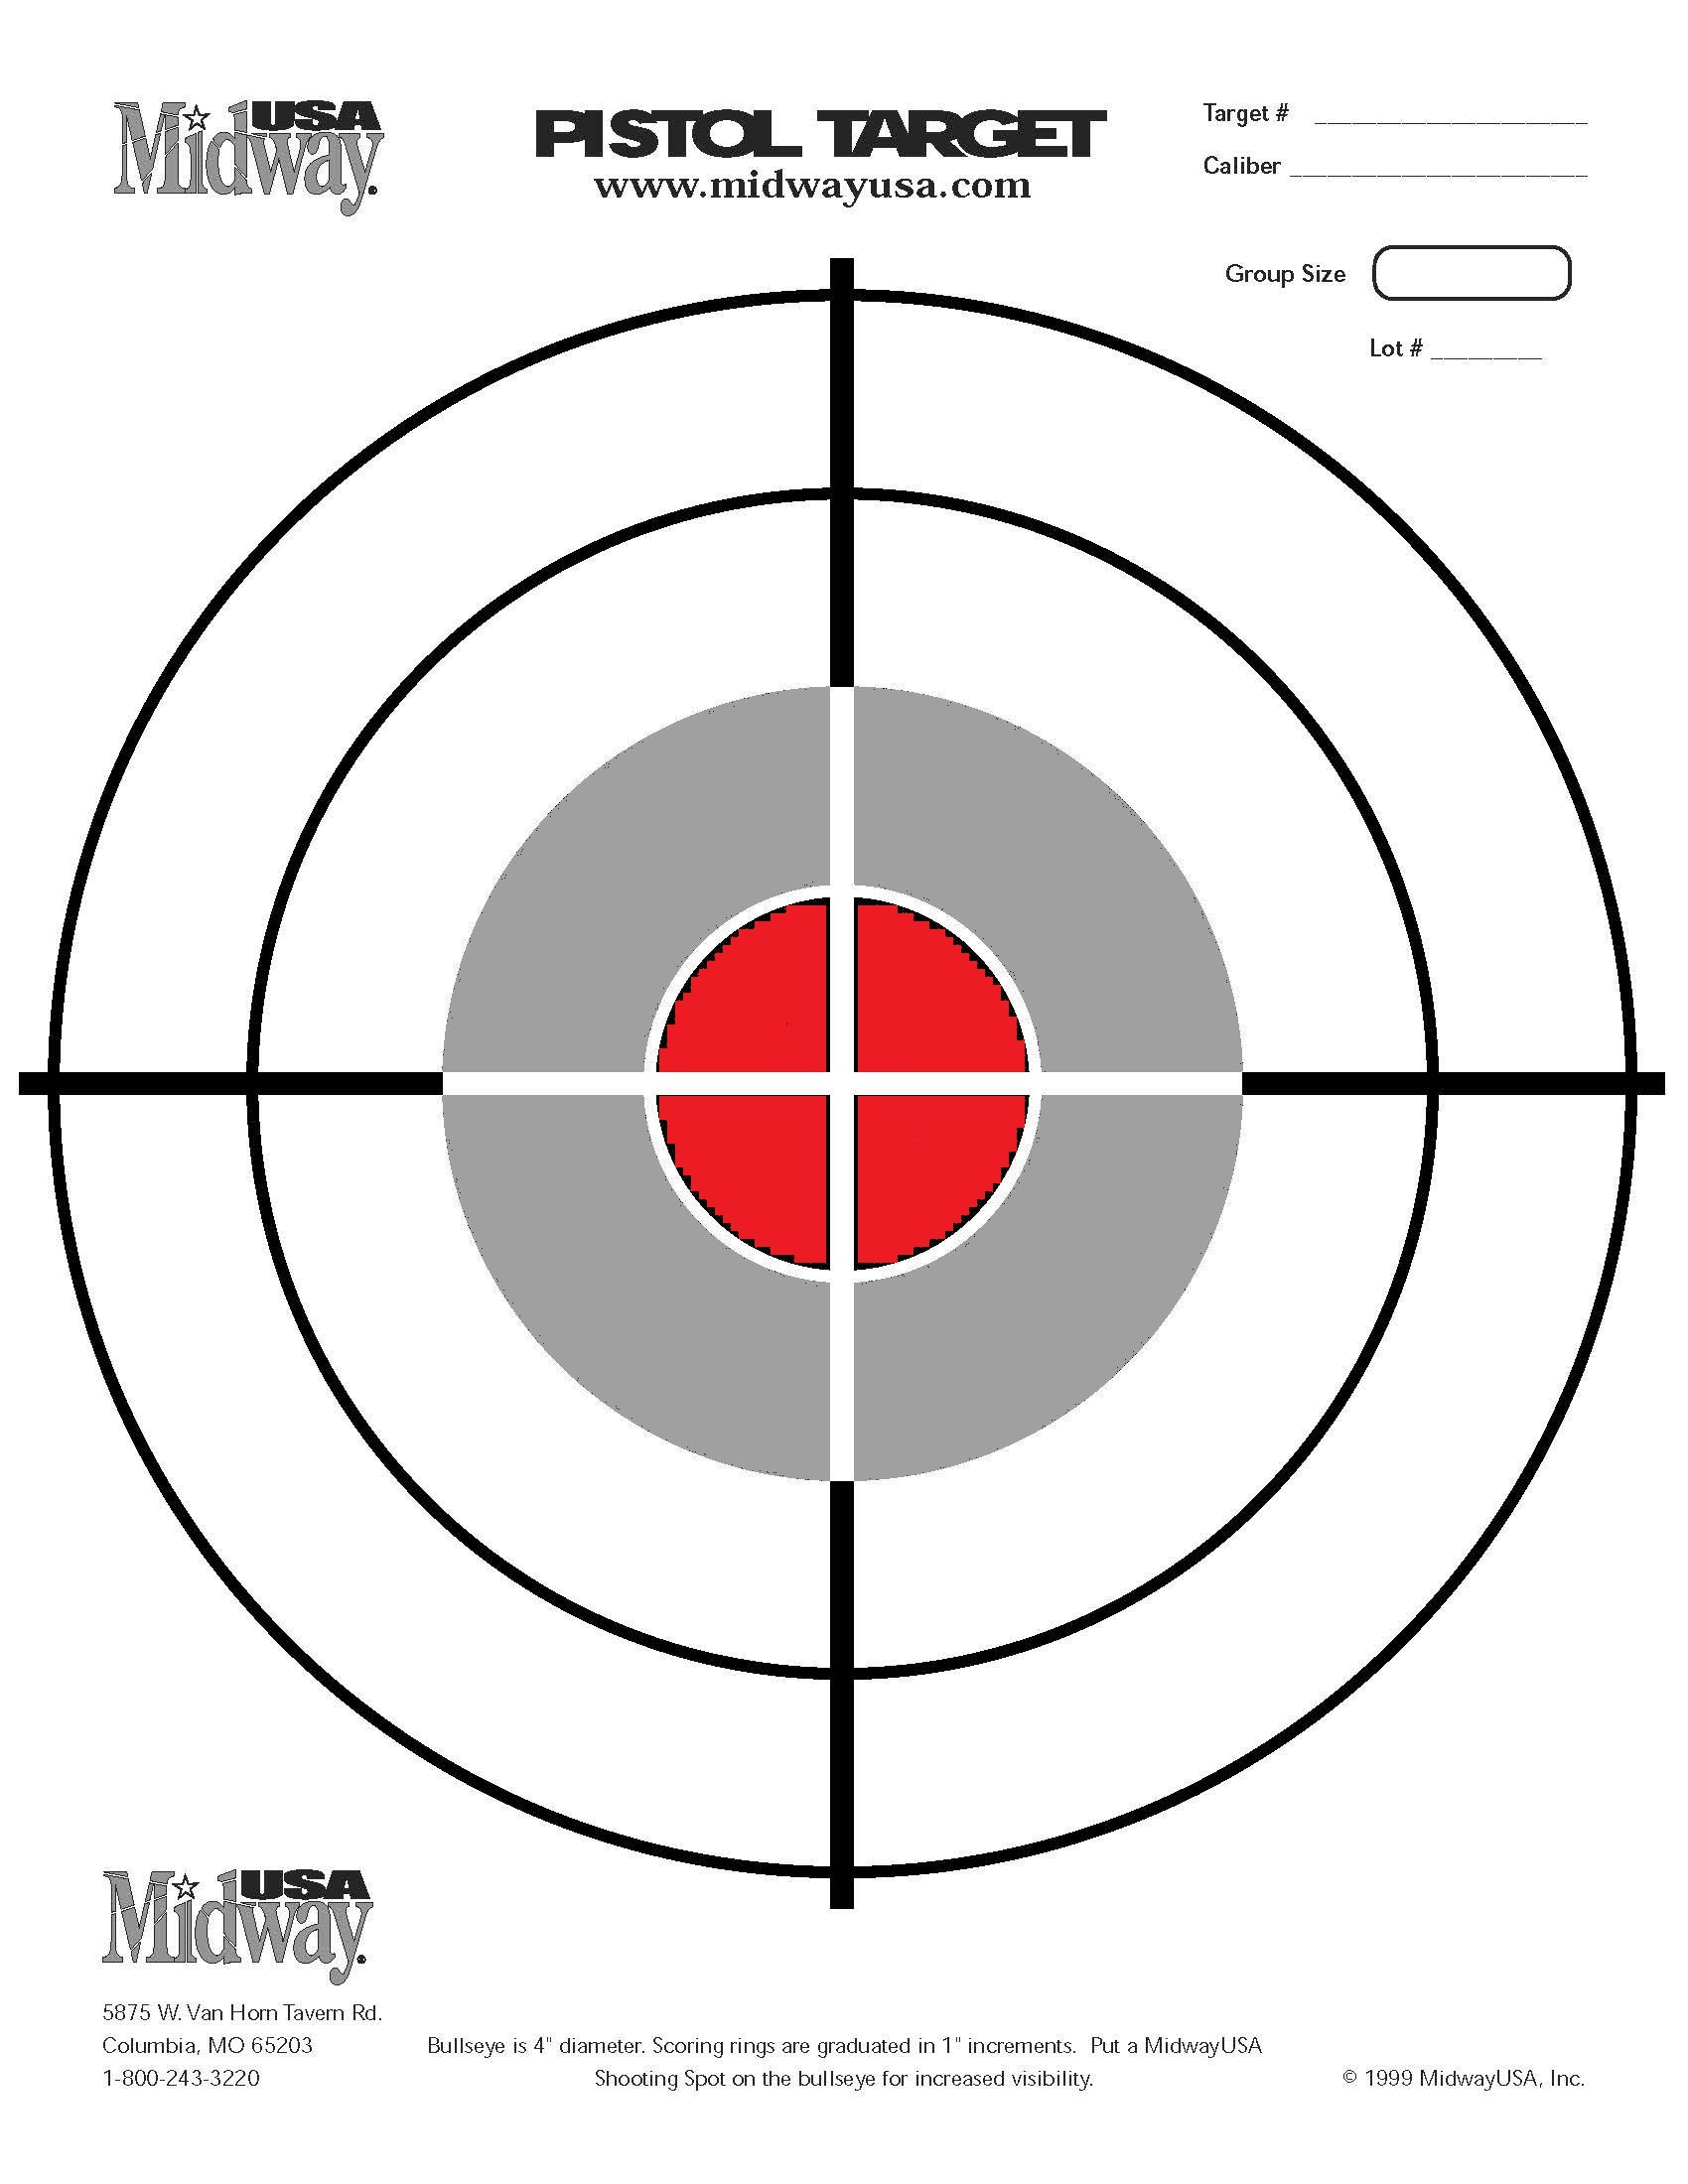 60 Fun Printable Targets   Kittybabylove - Free Printable Targets For Shooting Practice